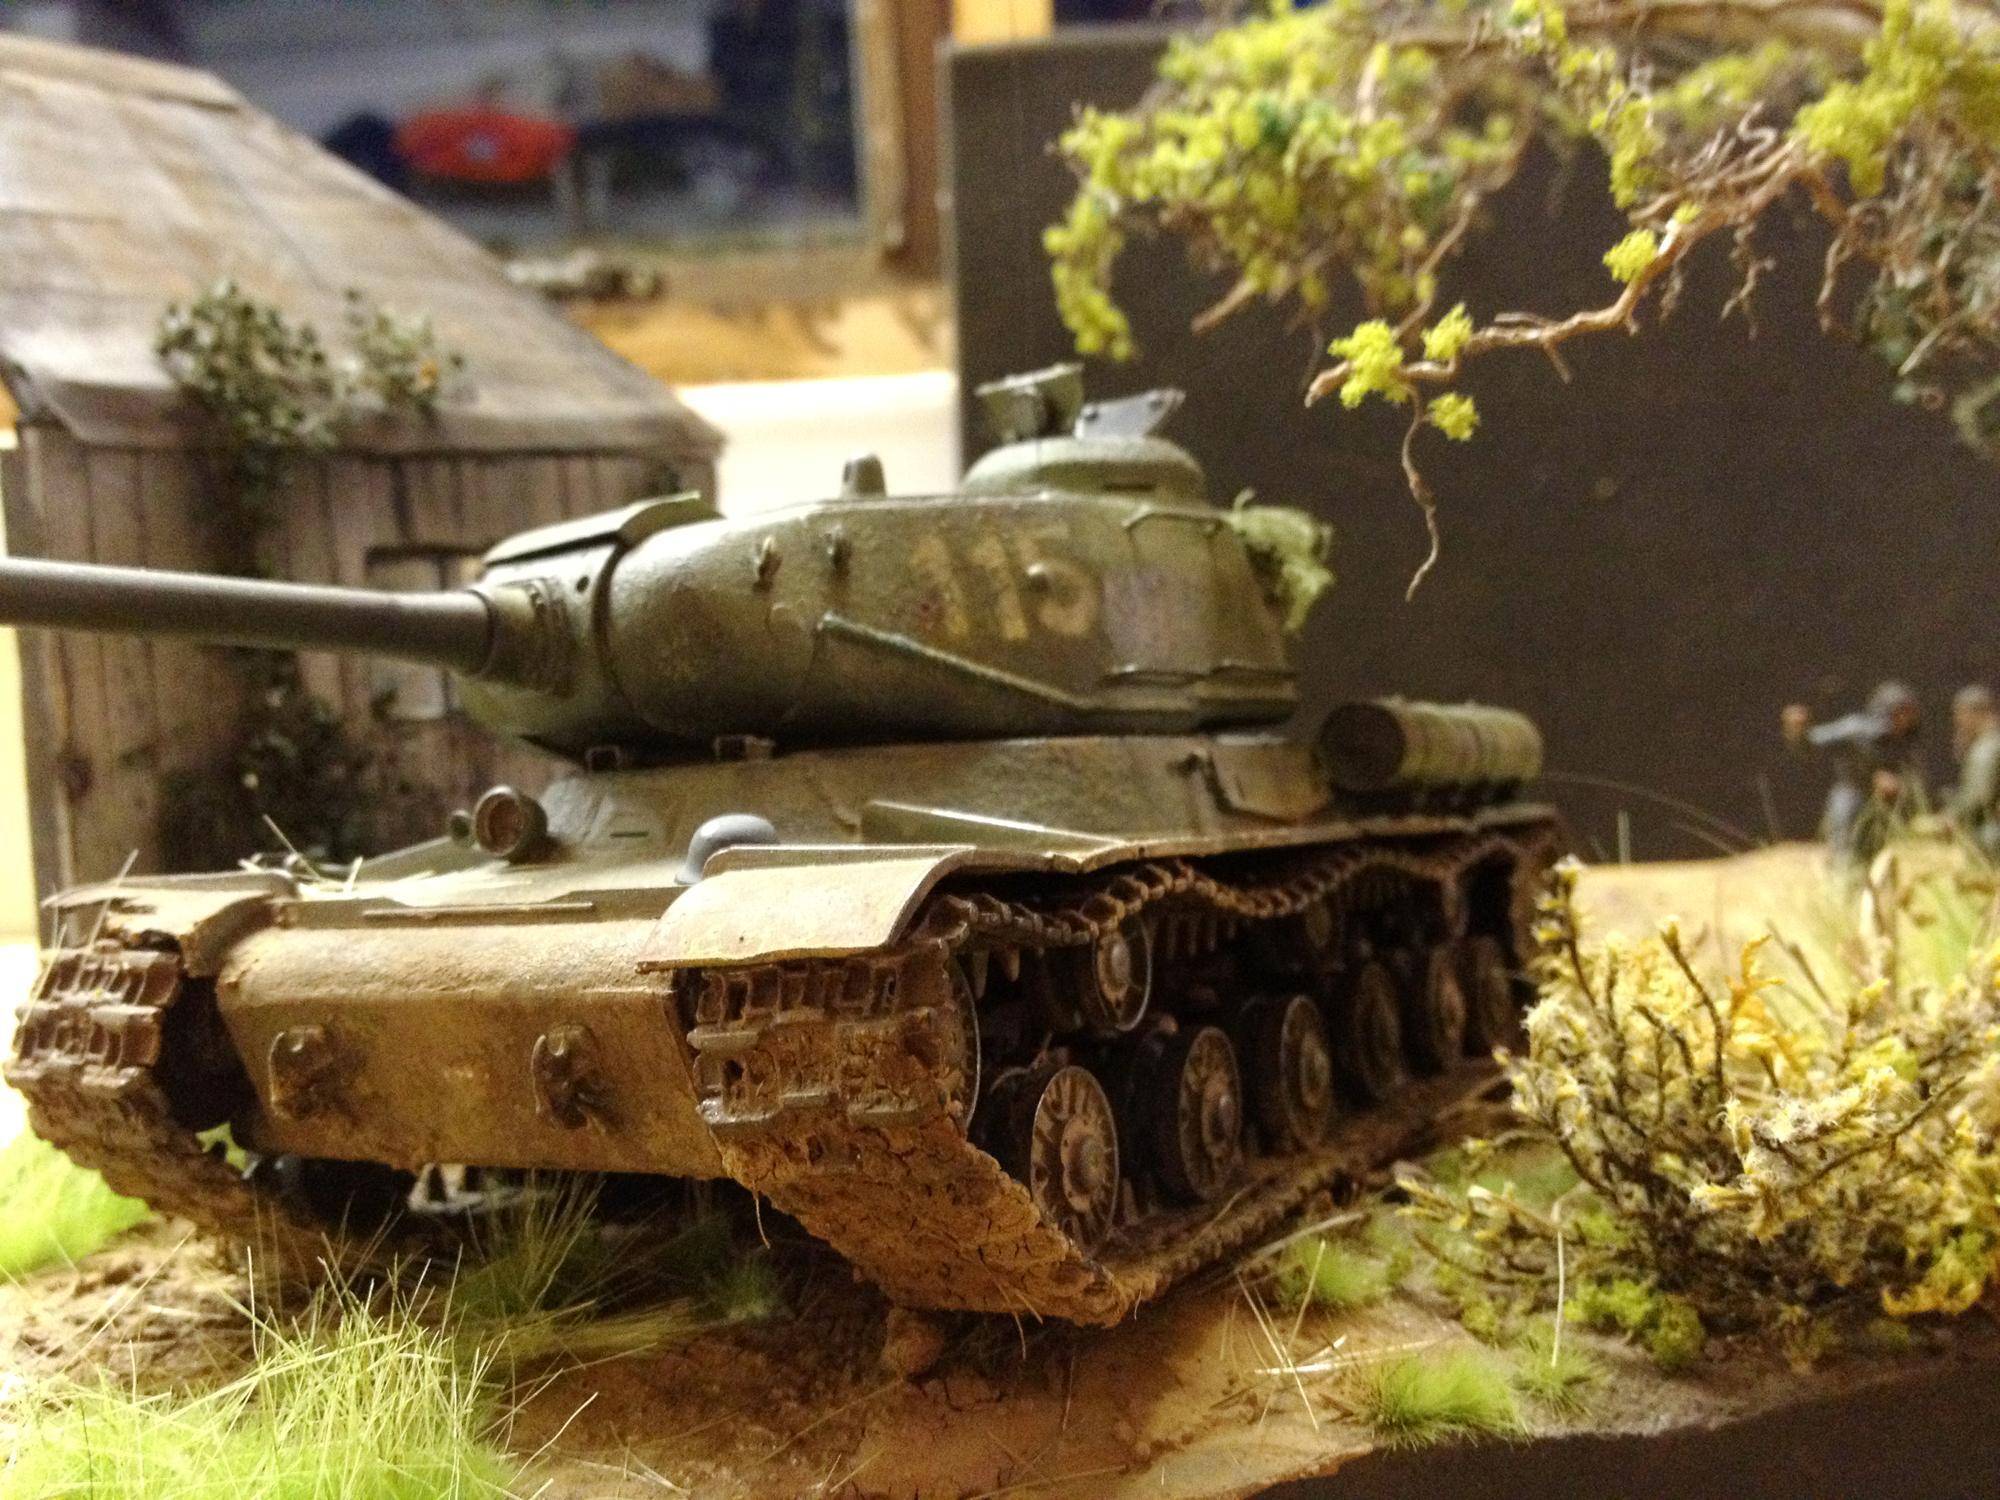 Imperial Guard, Is-2, Russians, Soviet, Tank, World War 2